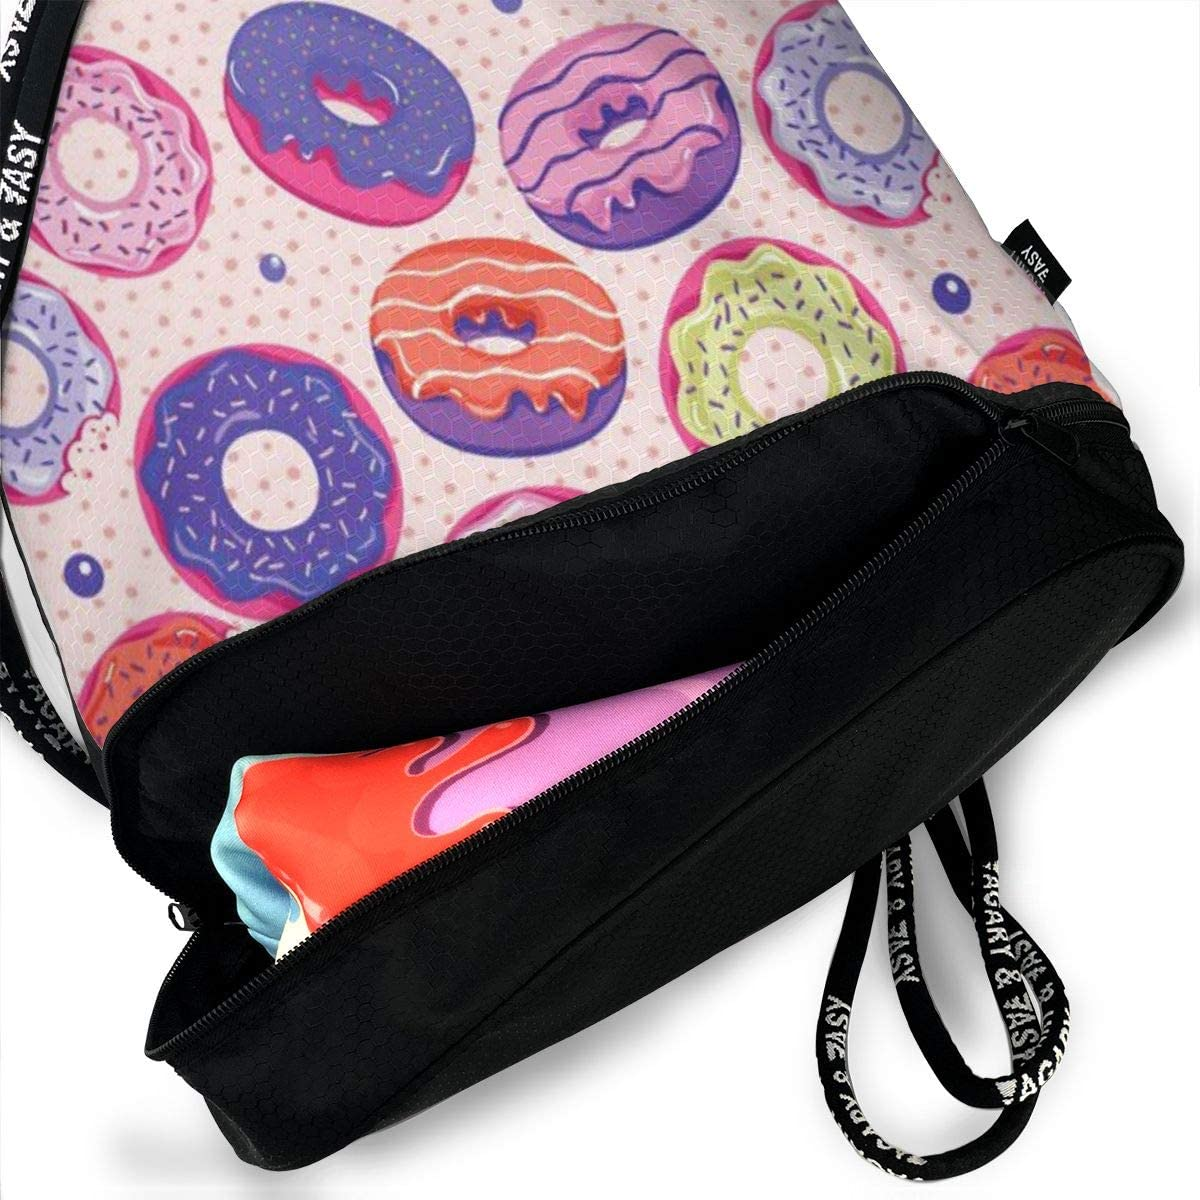 GymSack Drawstring Bag Sackpack Sweet Doughnut Sport Cinch Pack Simple Bundle Pocke Backpack For Men Women